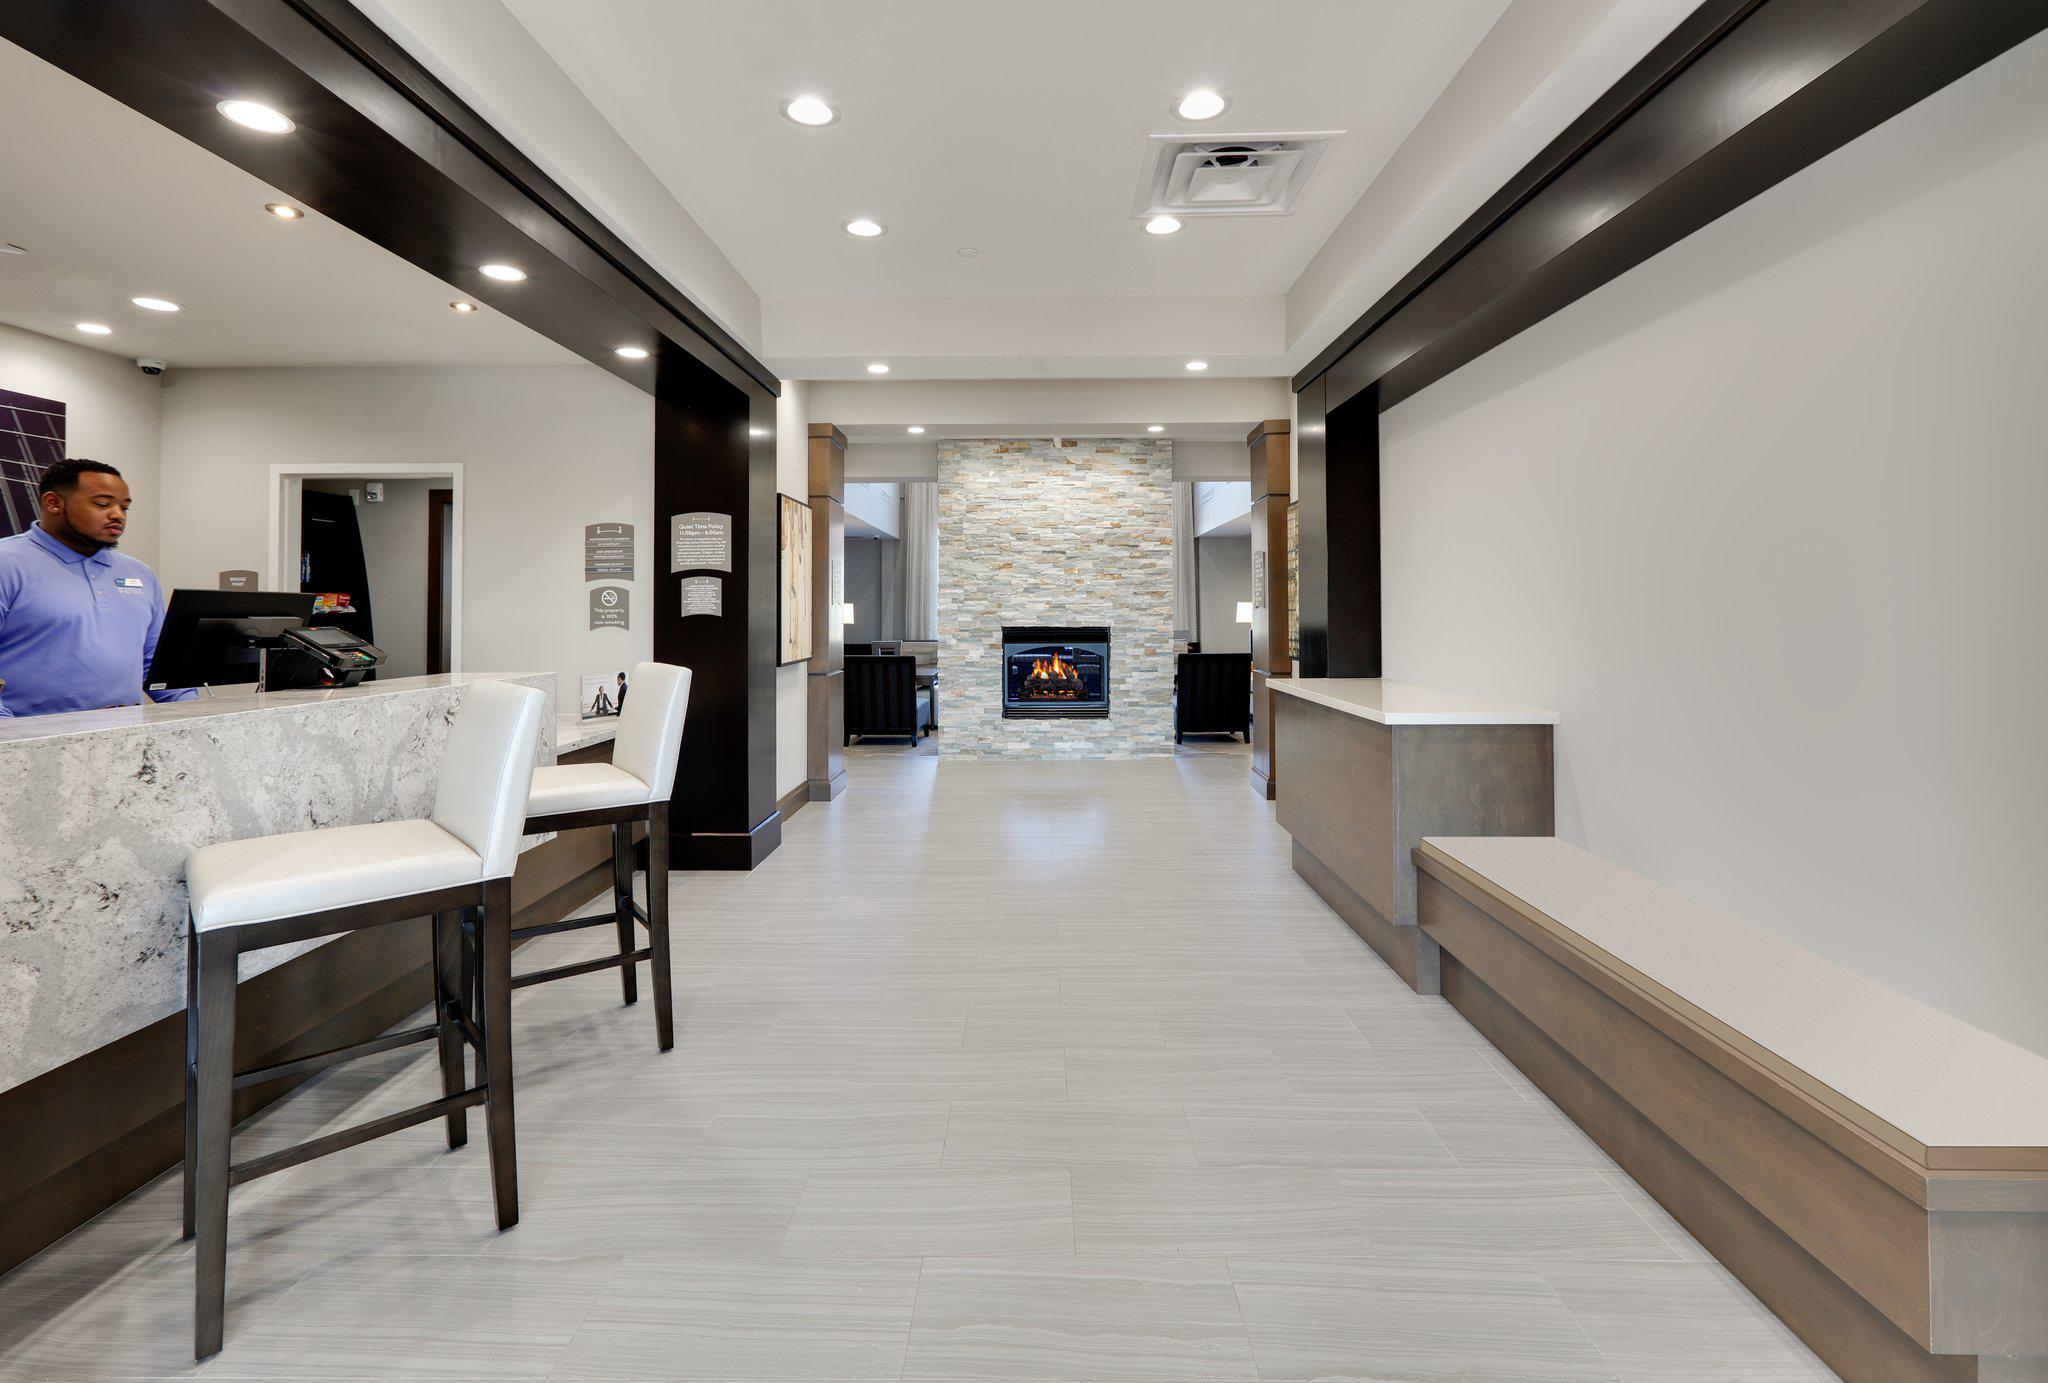 Staybridge Suites Oklahoma City Dwtn - Bricktown, an IHG Hotel